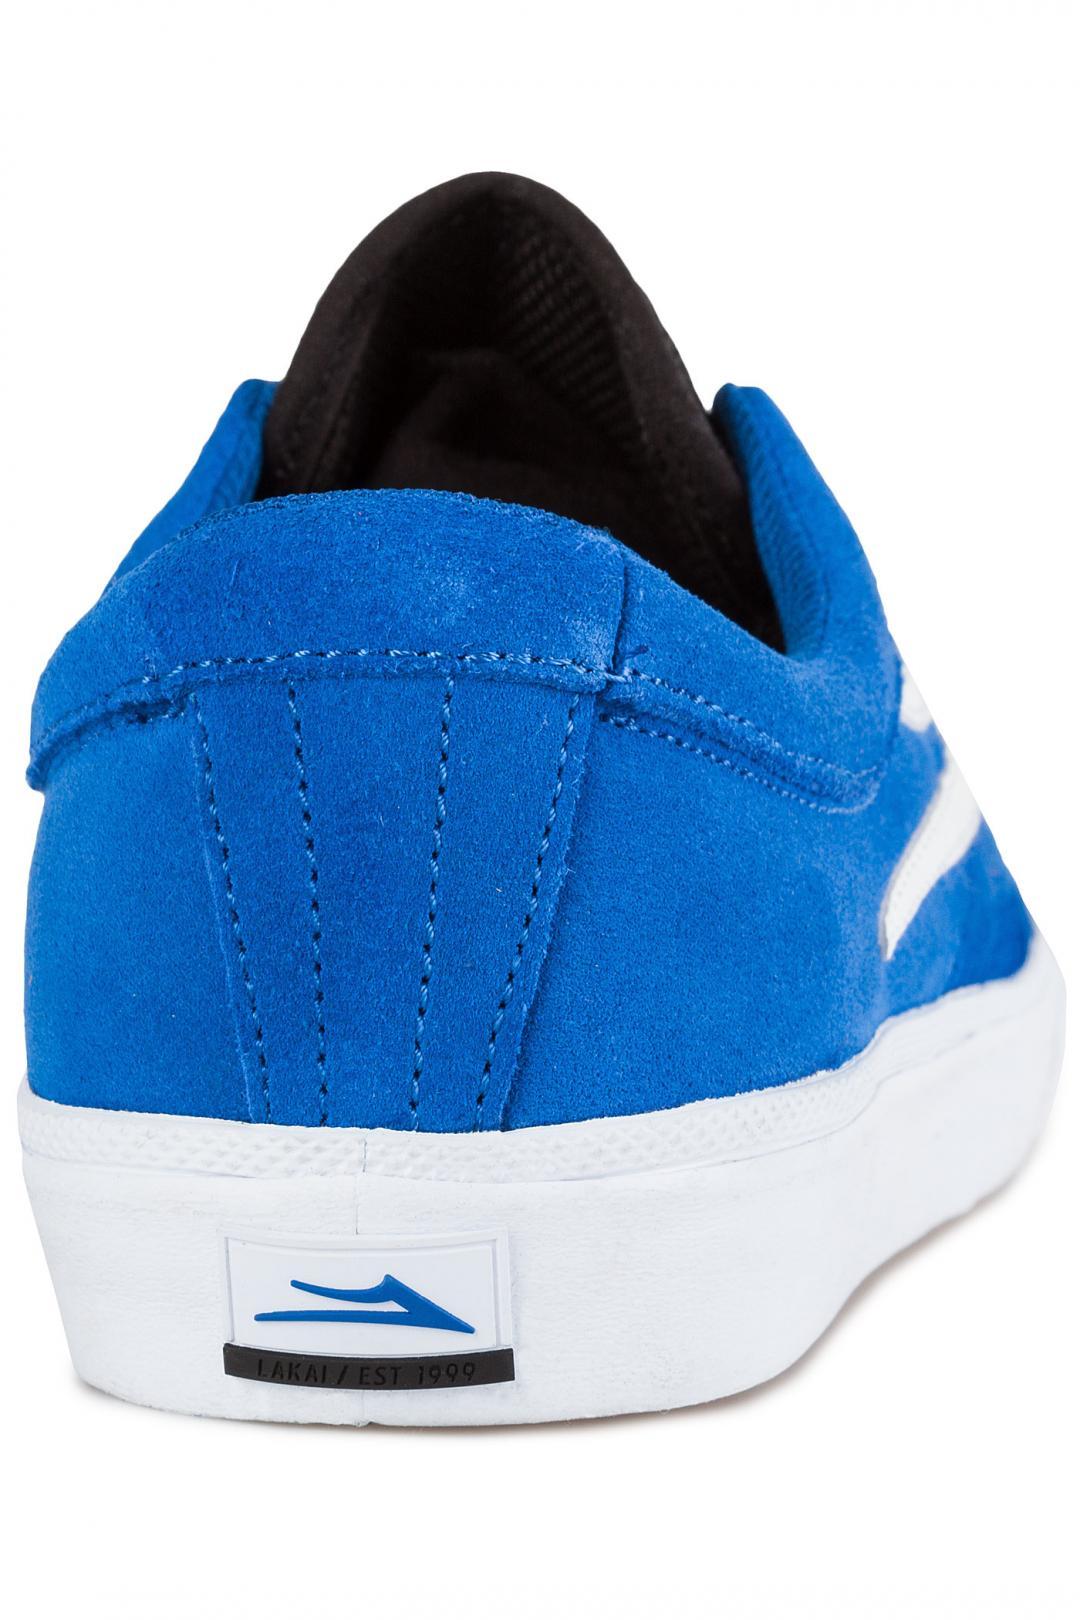 Uomo Lakai Sheffield Suede blue | Sneakers low top